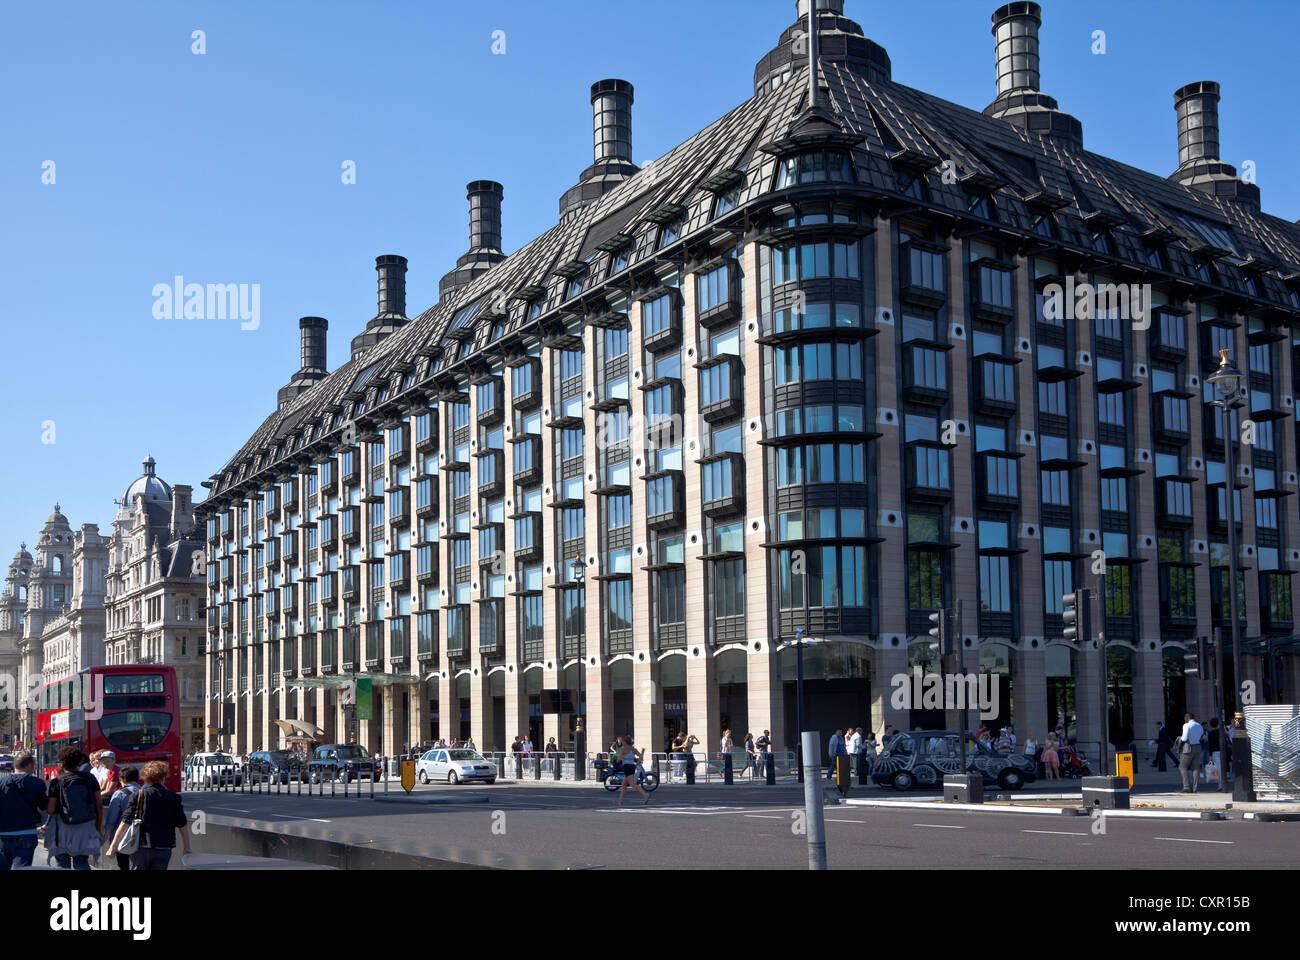 Portcullis House, Westminster - Stock Image